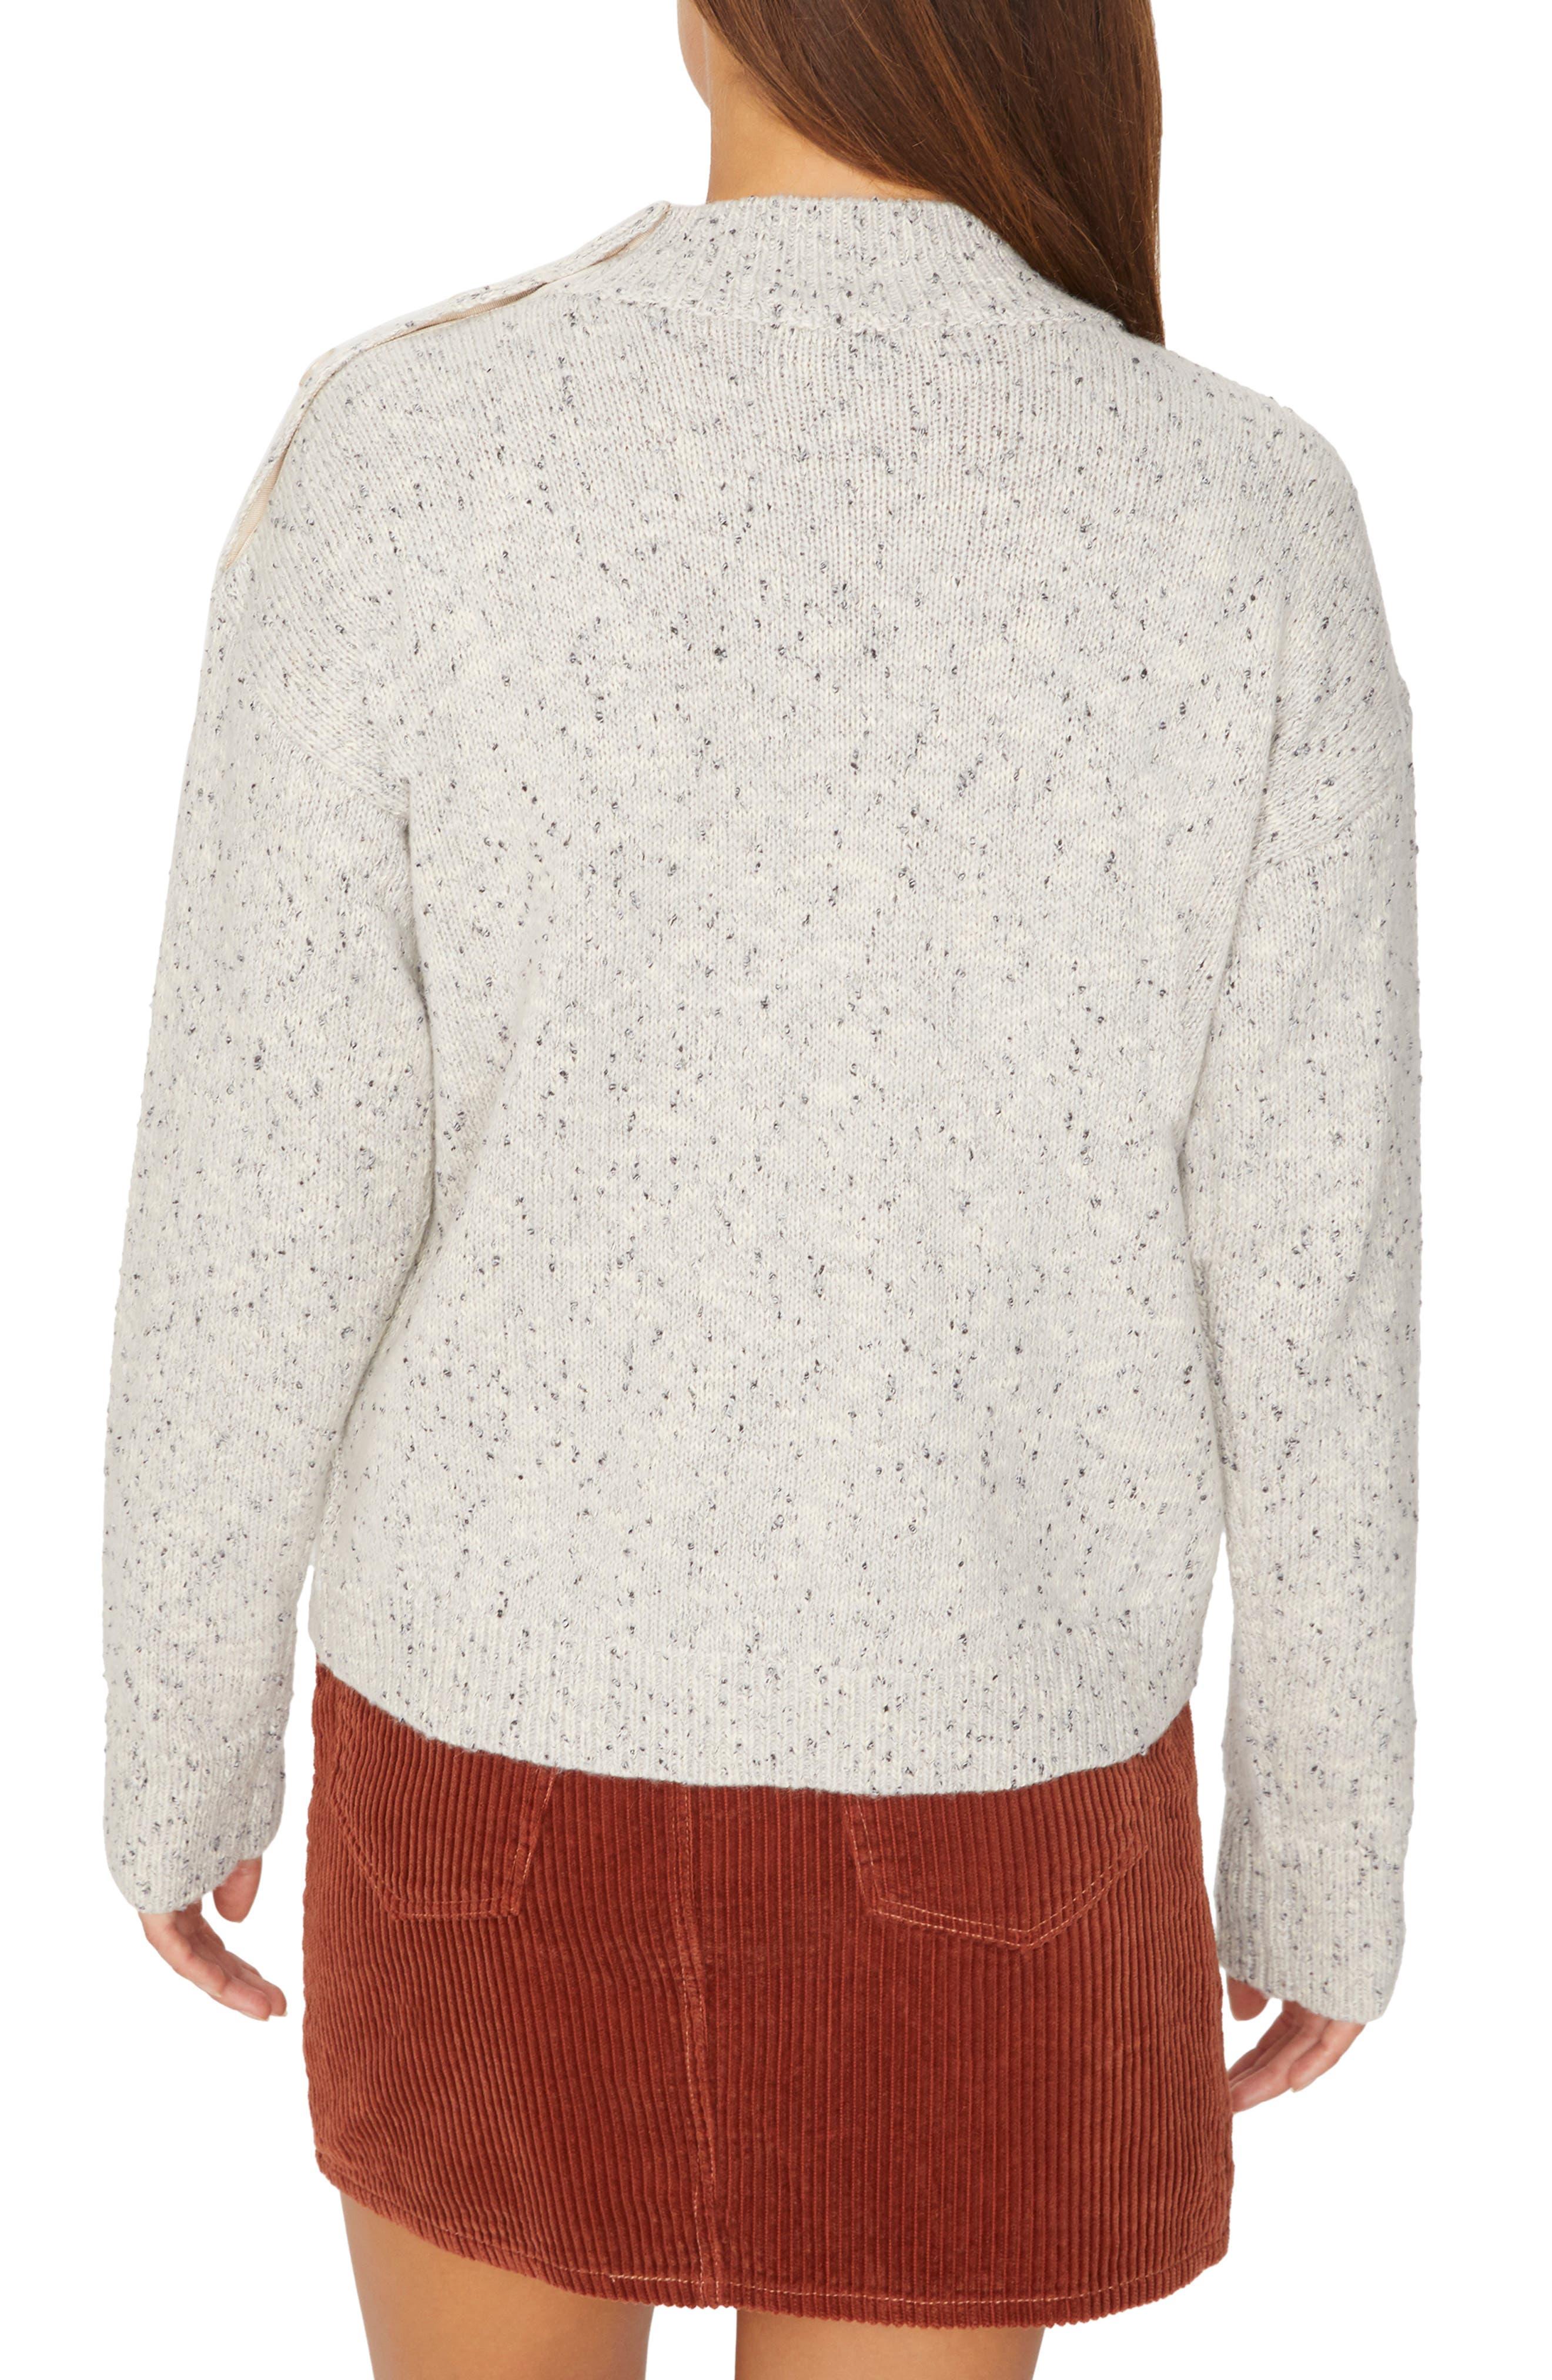 Jasper Button Detail Mock Neck Sweater,                             Alternate thumbnail 2, color,                             HEATHER STERLING